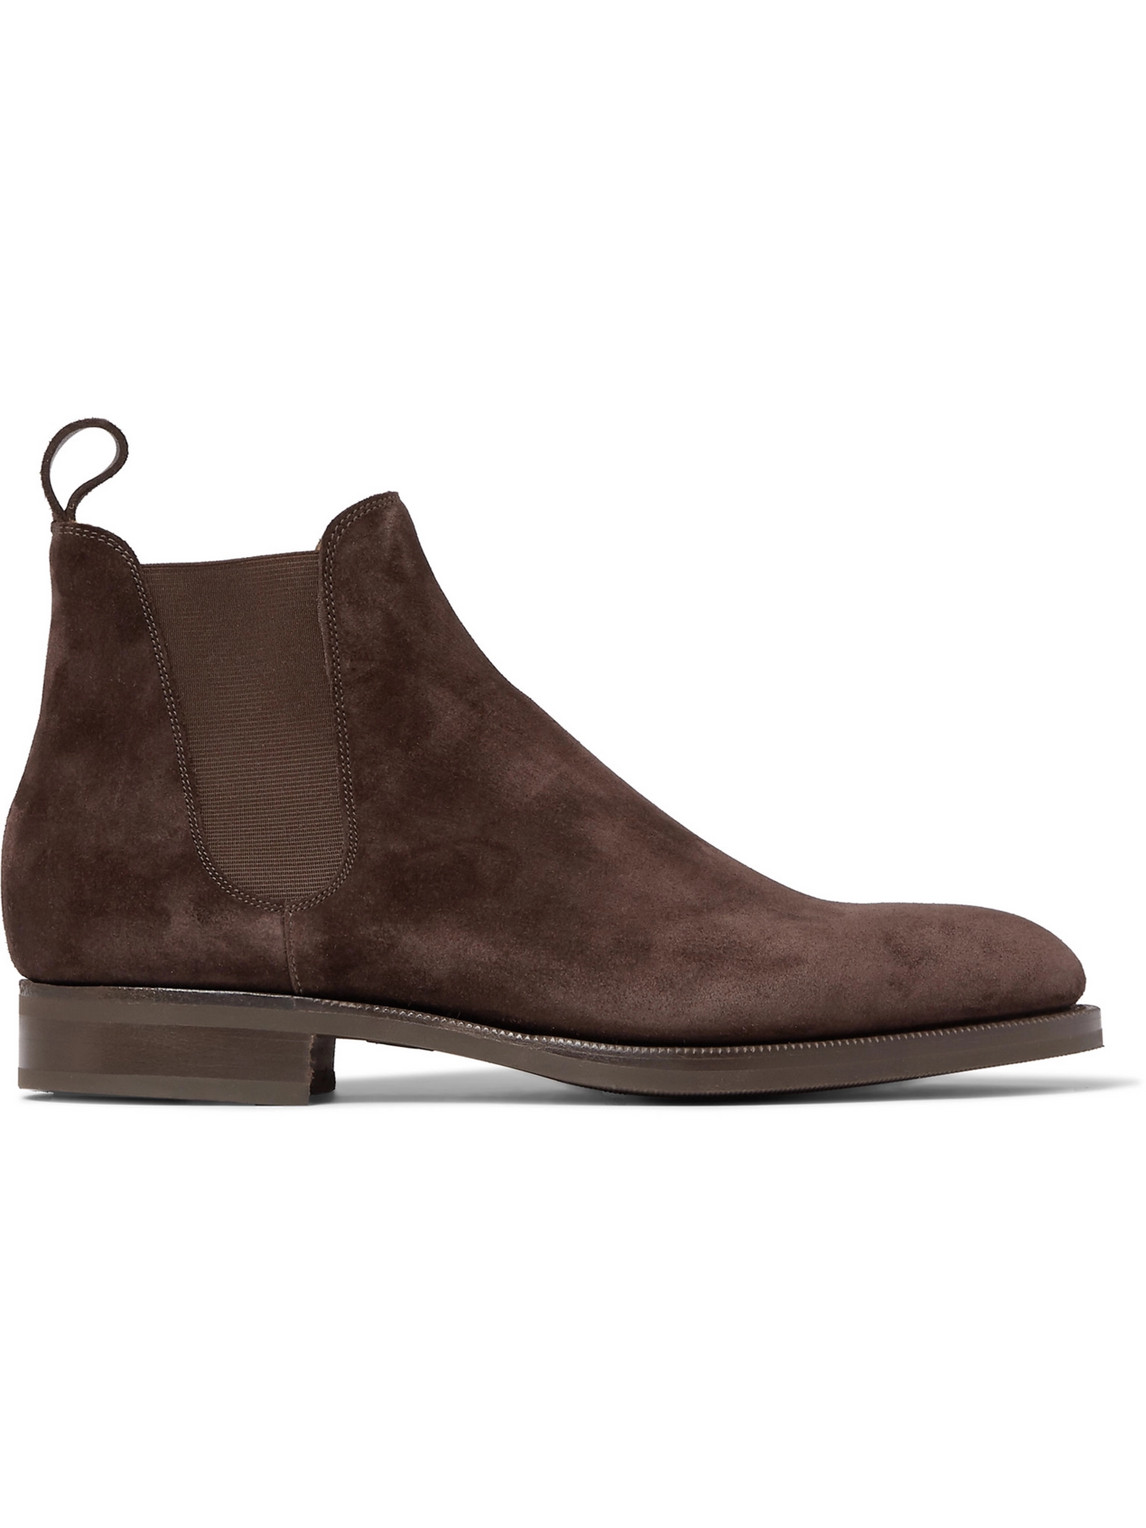 edward green - camden suede chelsea boots - men - brown - uk 10.5